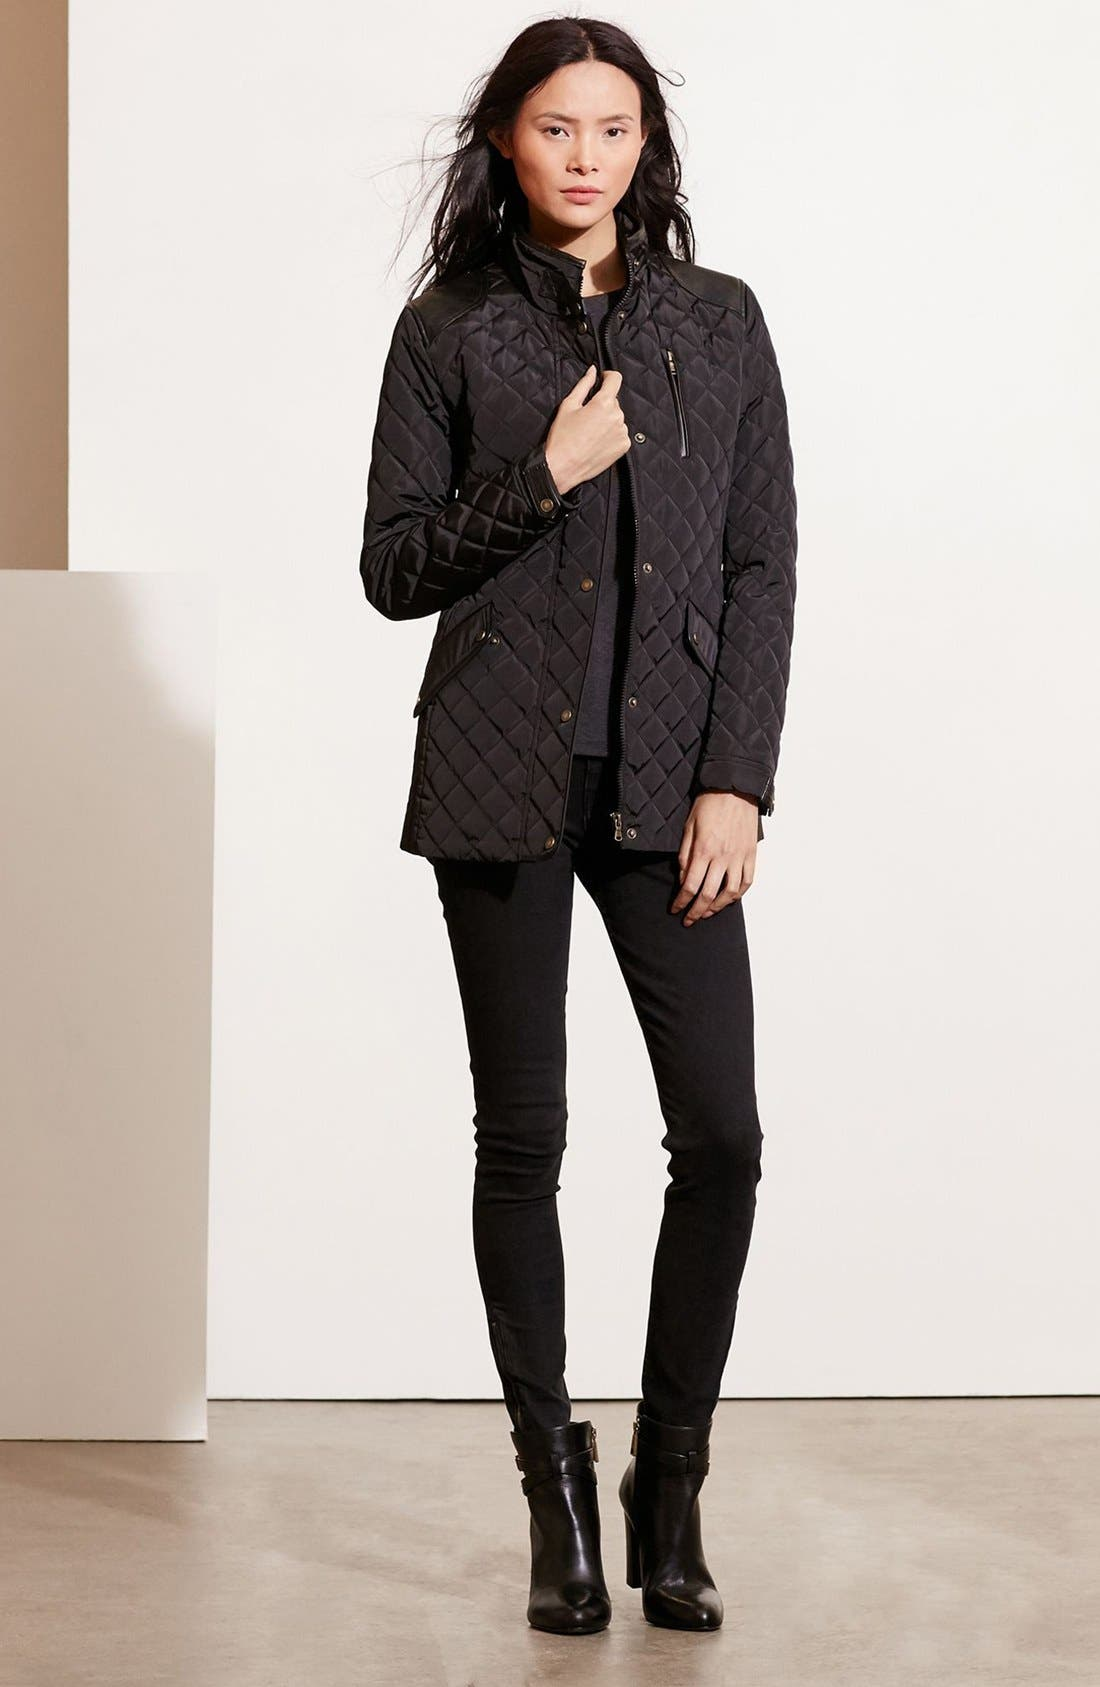 Main Image - Lauren Ralph Lauren Diamond Quilted Jacket with Faux Leather Trim (Regular & Petite)